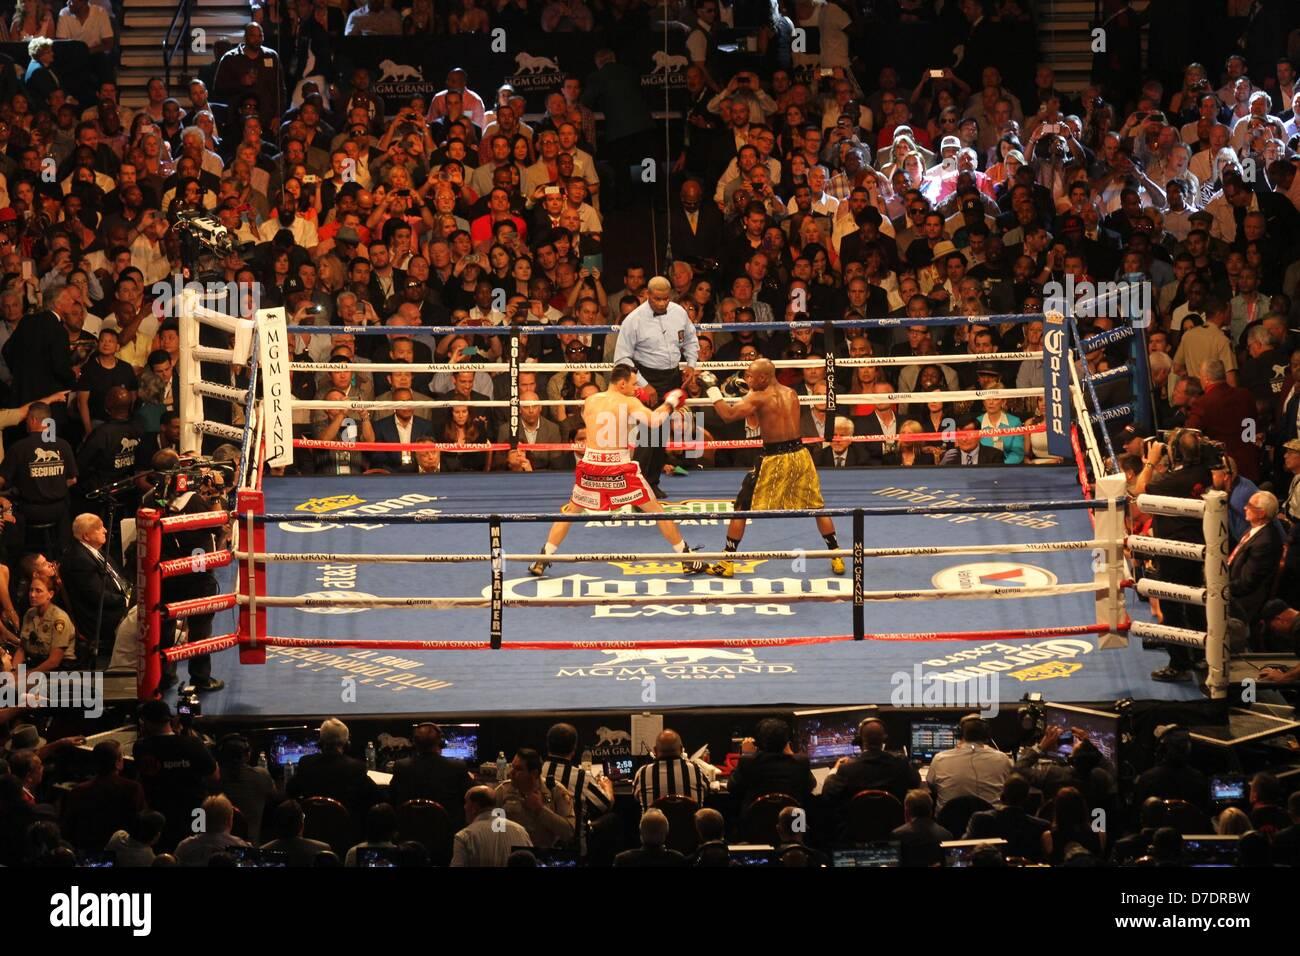 Mgm Grand Garden Arena Boxing Stock Photos & Mgm Grand Garden Arena ...